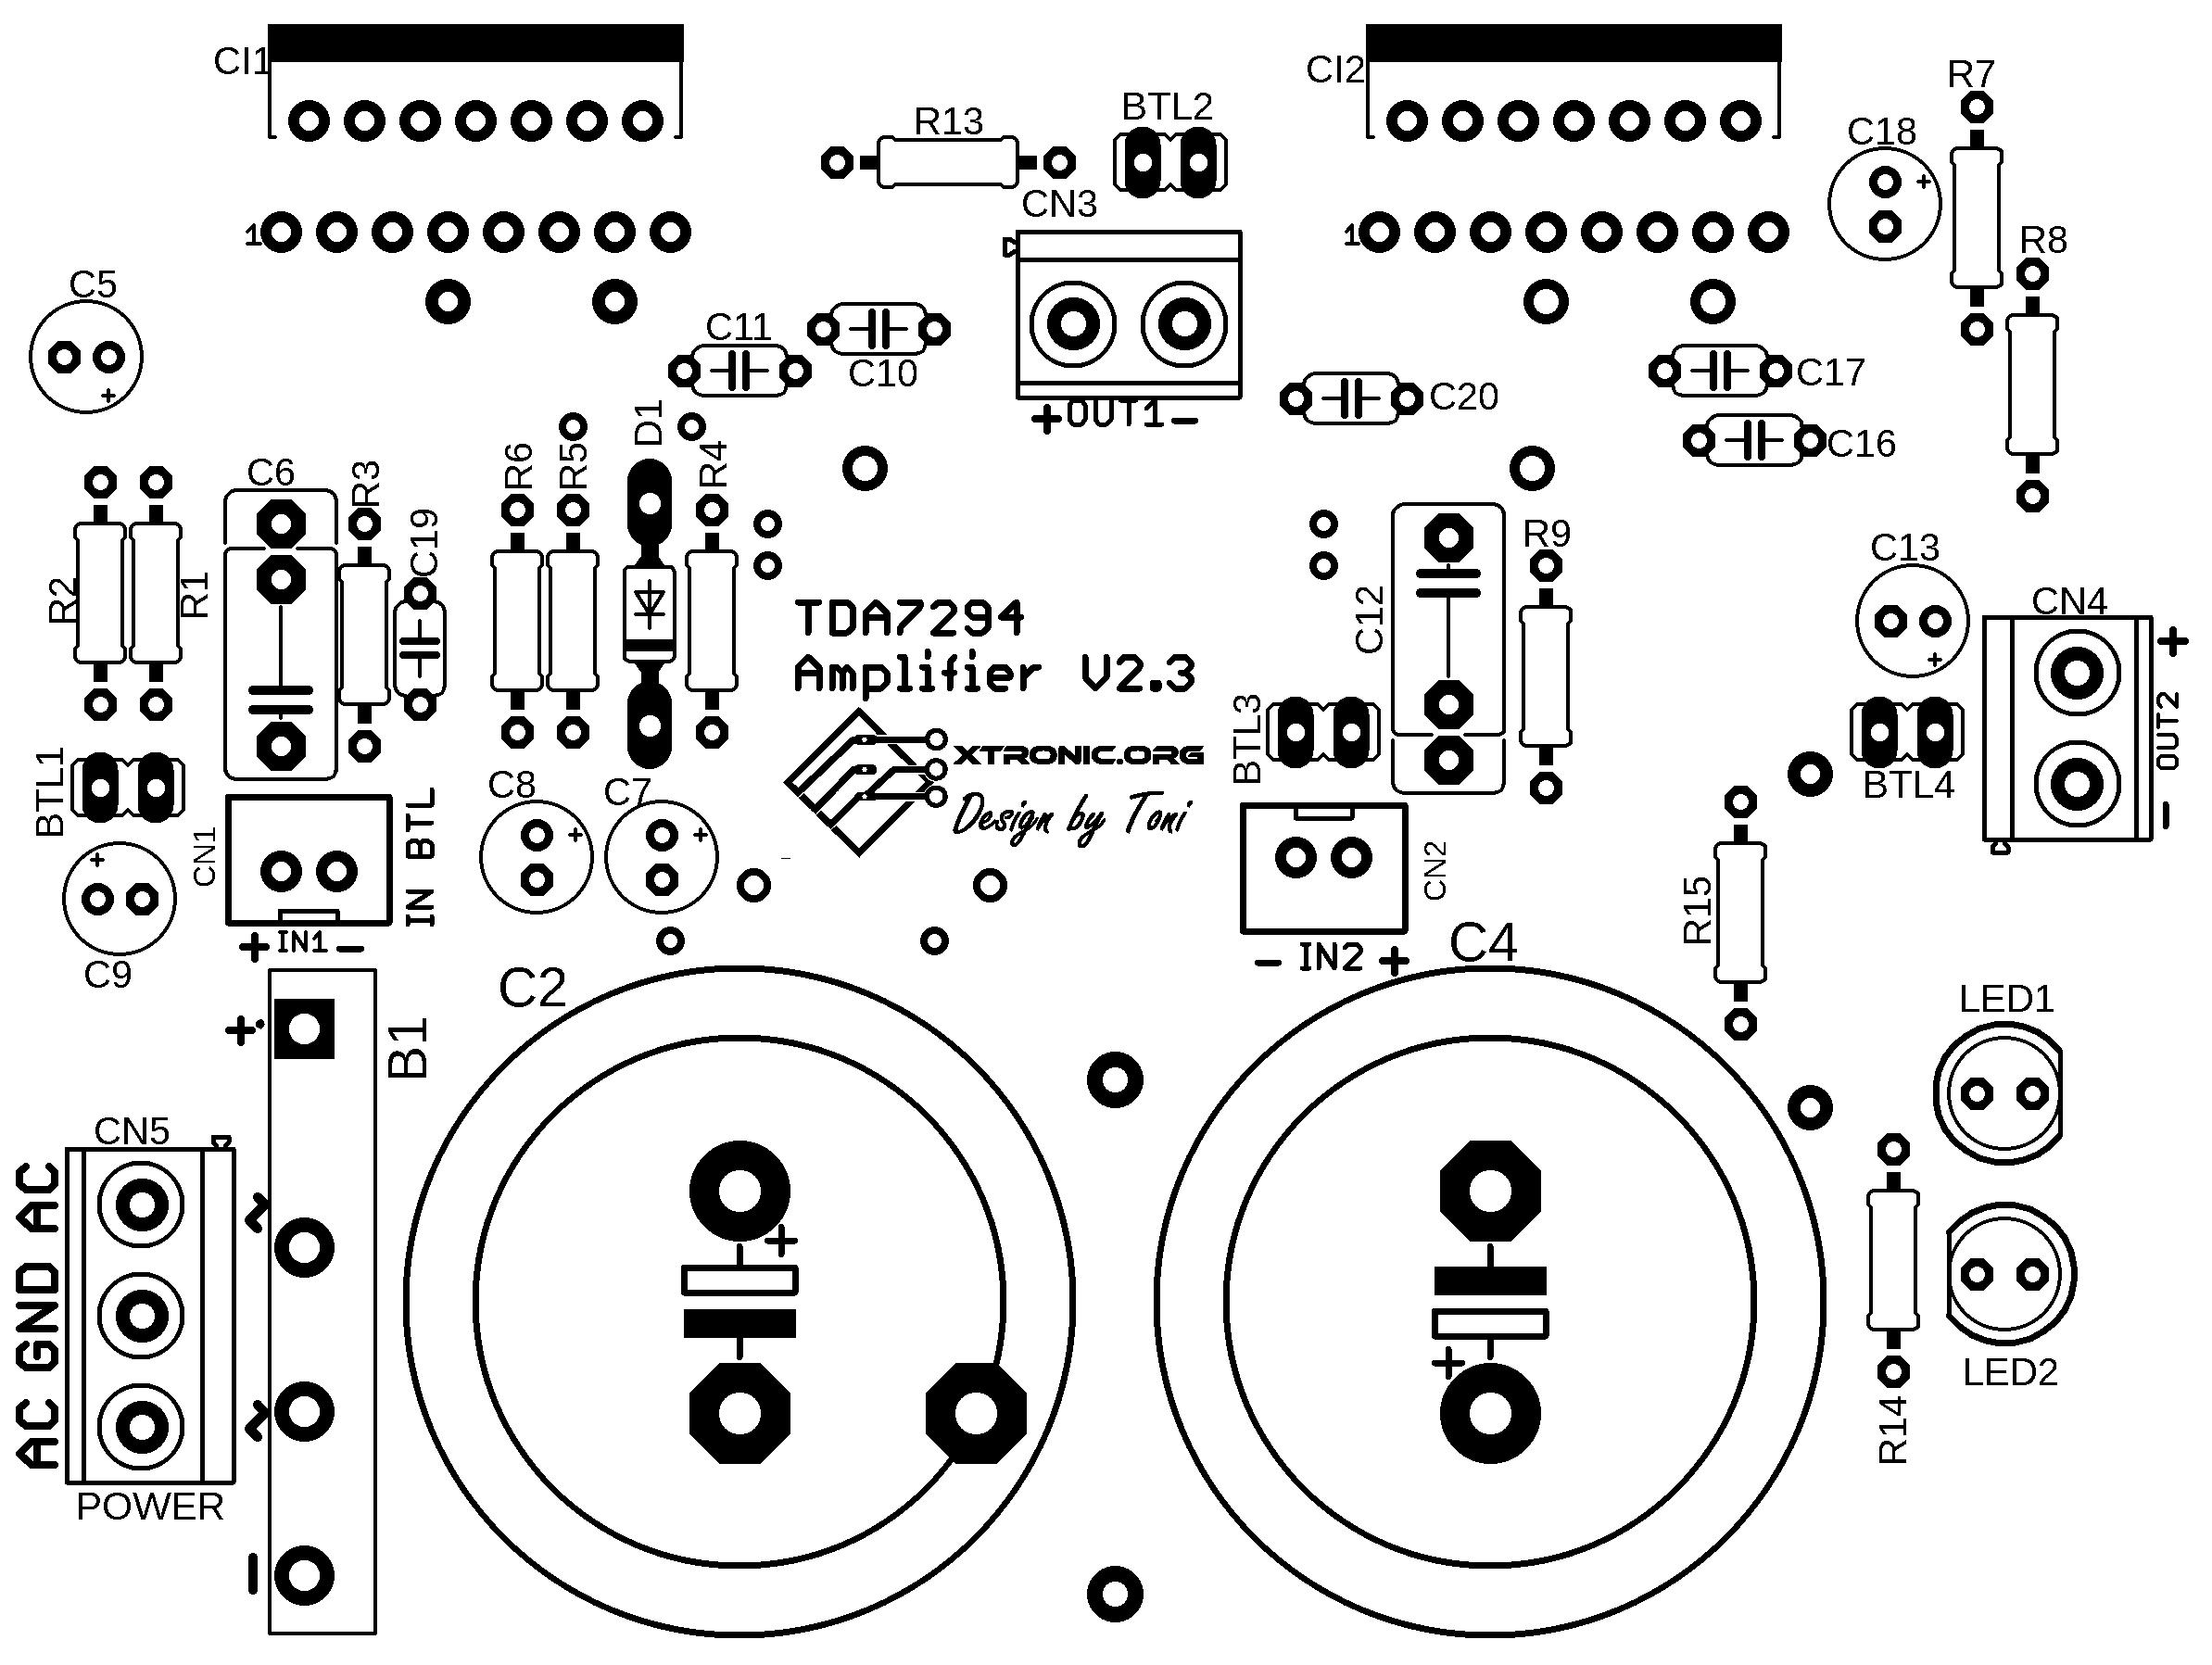 50w Power Amplifier With Ic Tda7294 Auto Electrical Wiring Diagram 20w Bridge Tda2005 Simple Electronic Circuit Dynamic